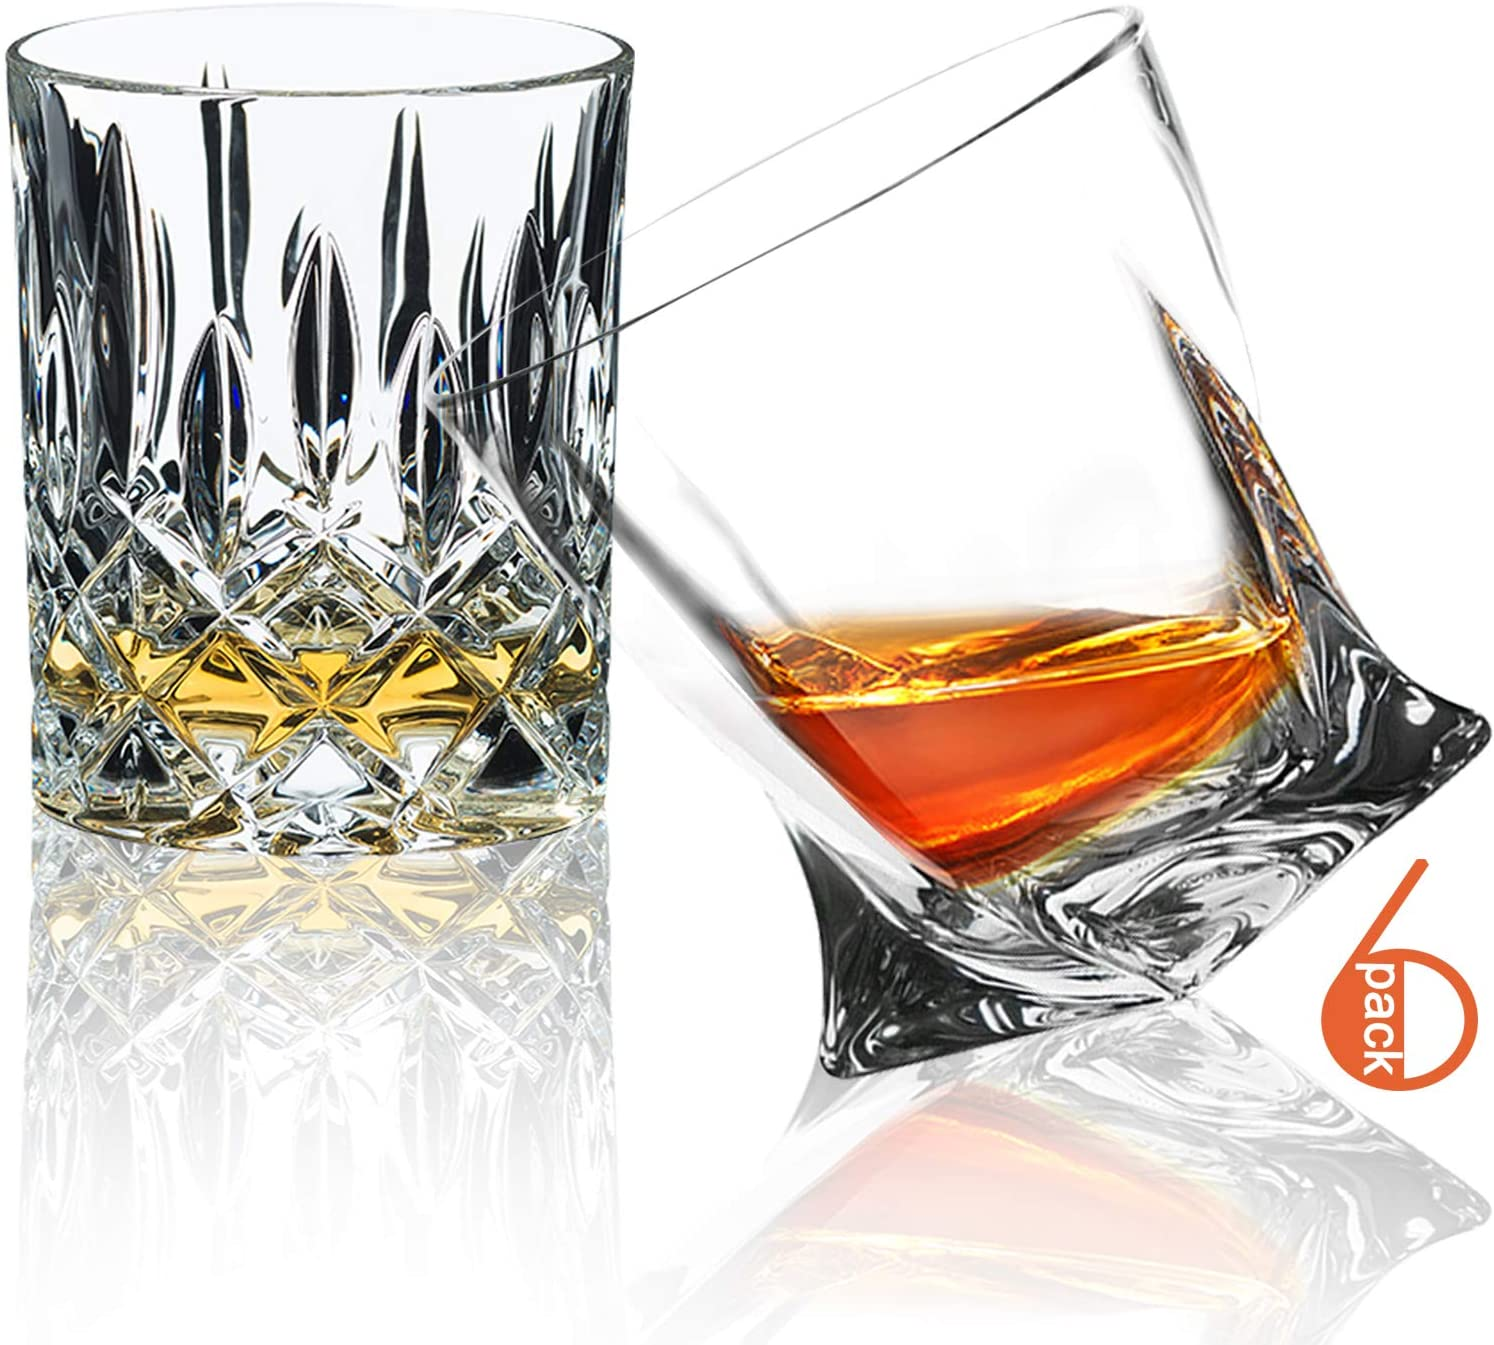 Whiskey Glasses,6 Pack,10 OZ Scotch Glasses,Tumblers for Drinking Bourbon/Scotch Glasses/Bar Whiskey Glasses/Glassware Gift Set/ 2 styles (Premium)